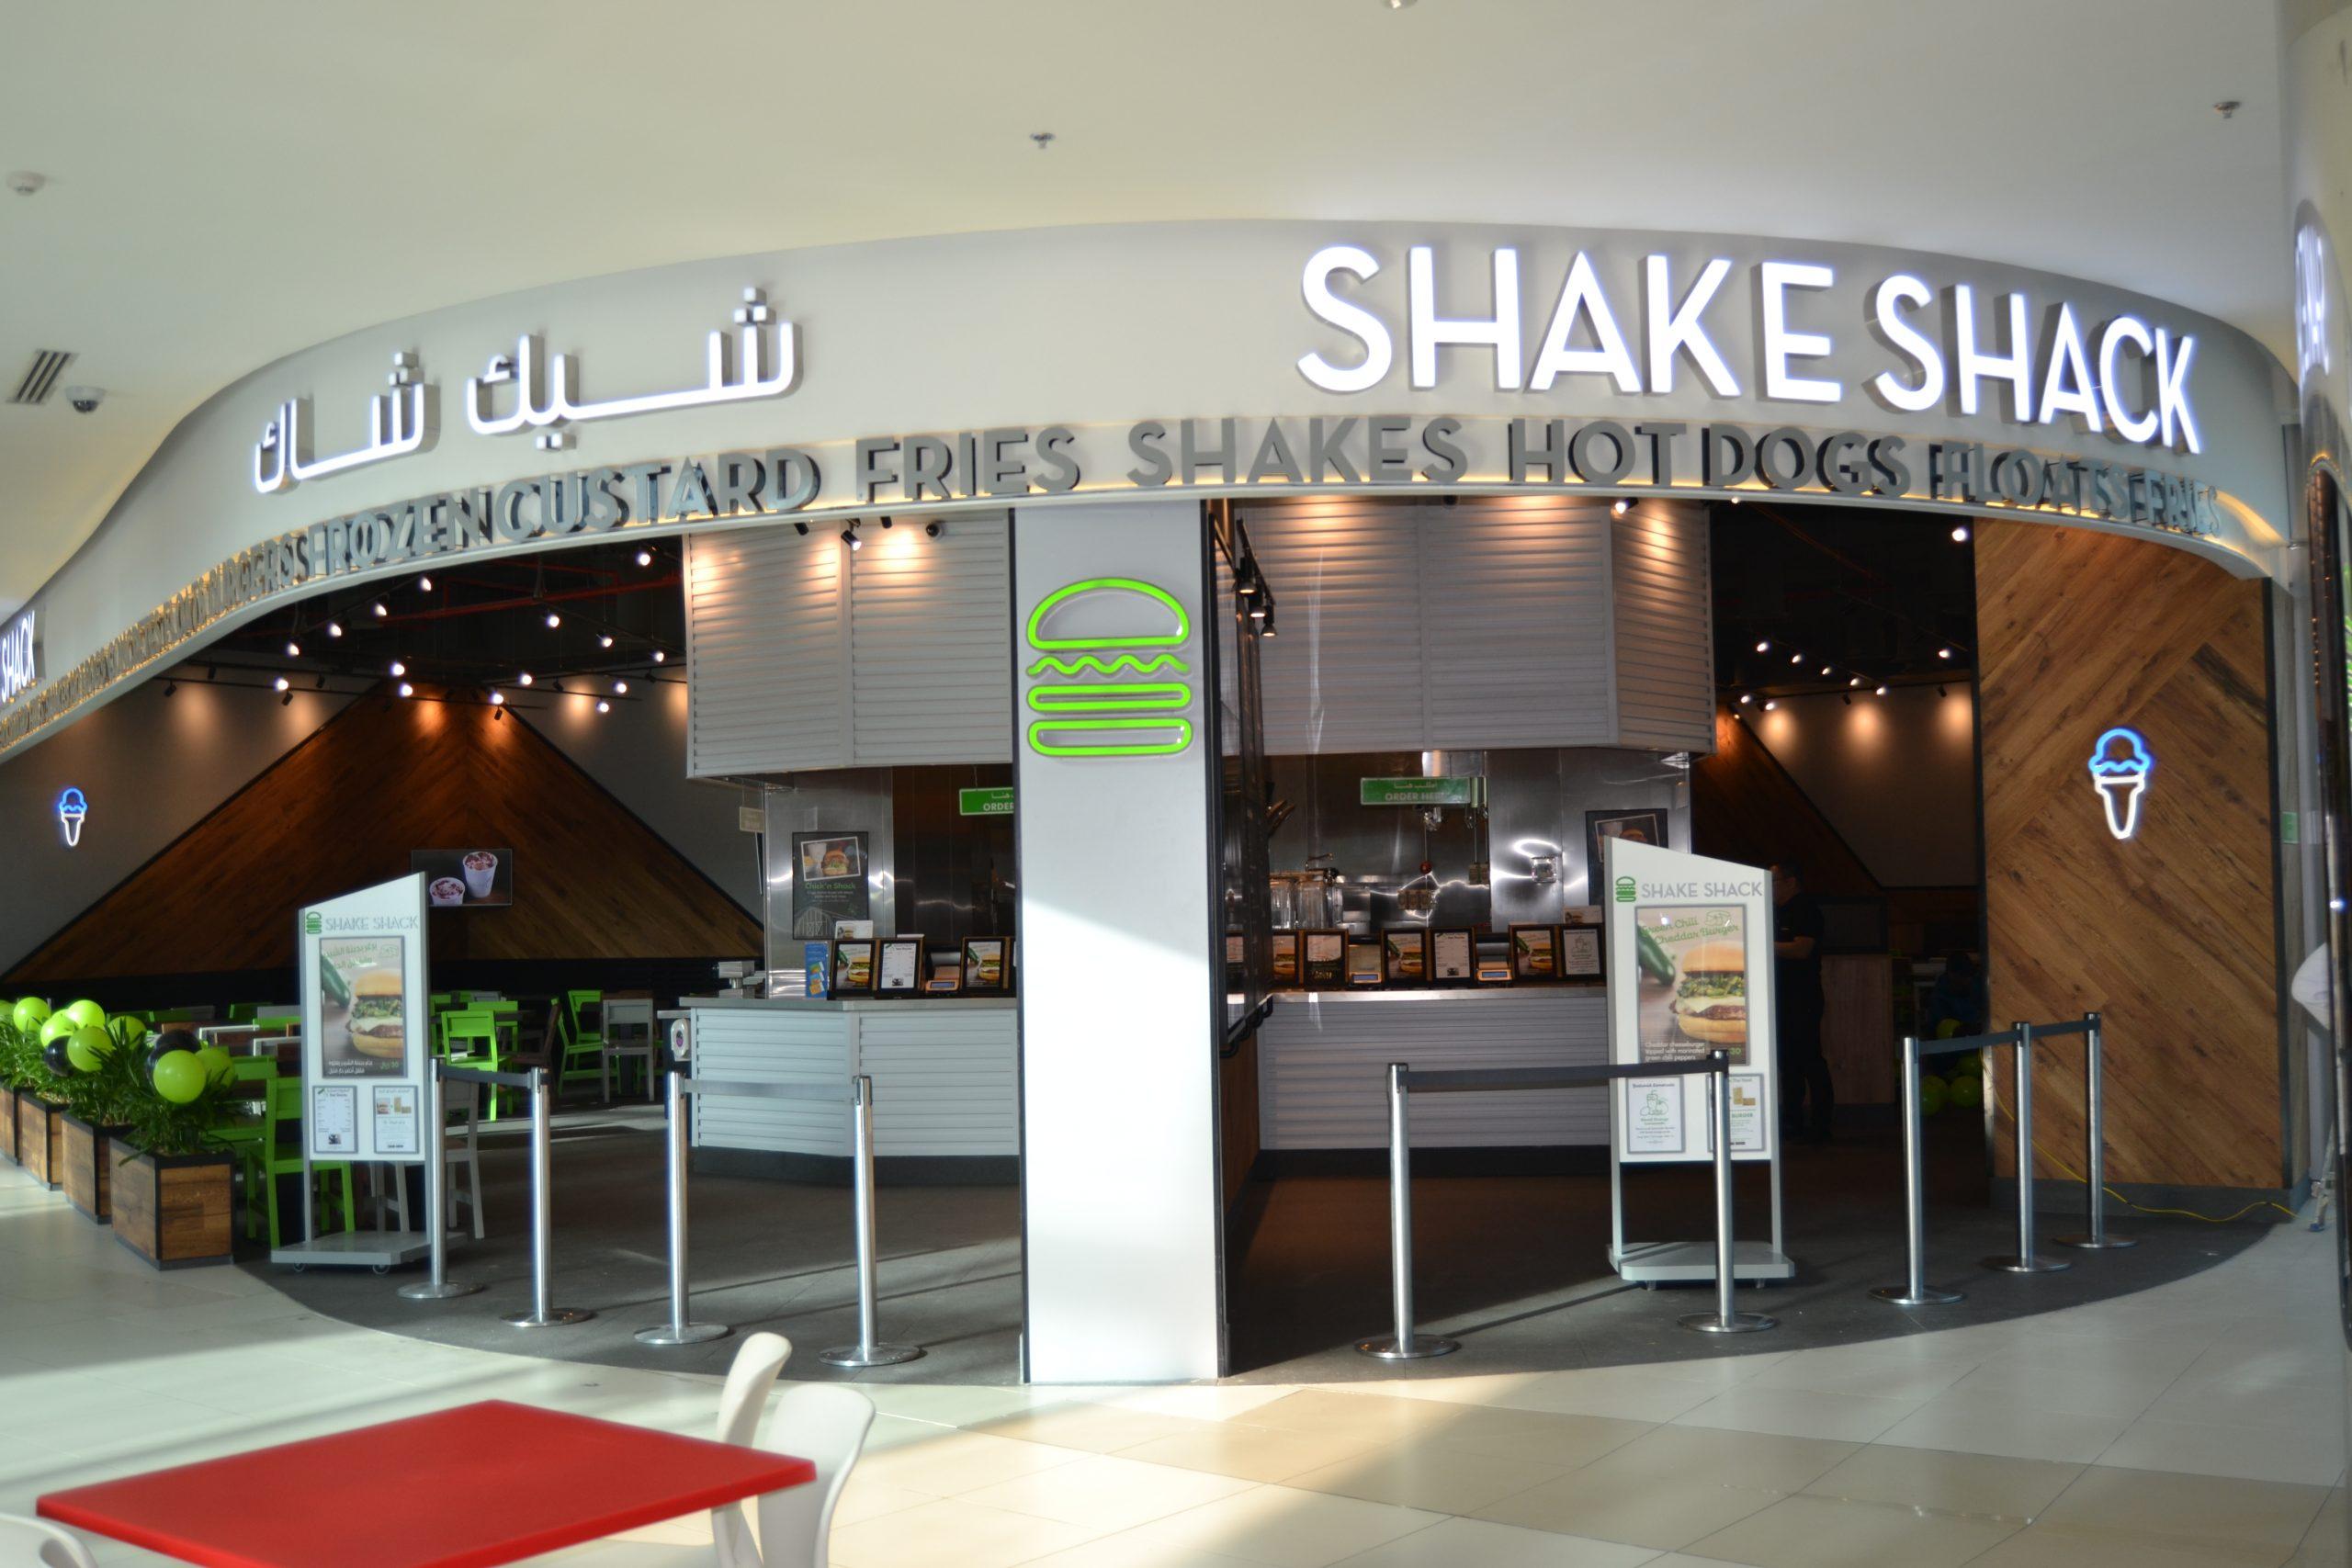 SHAKE SHACK gallery